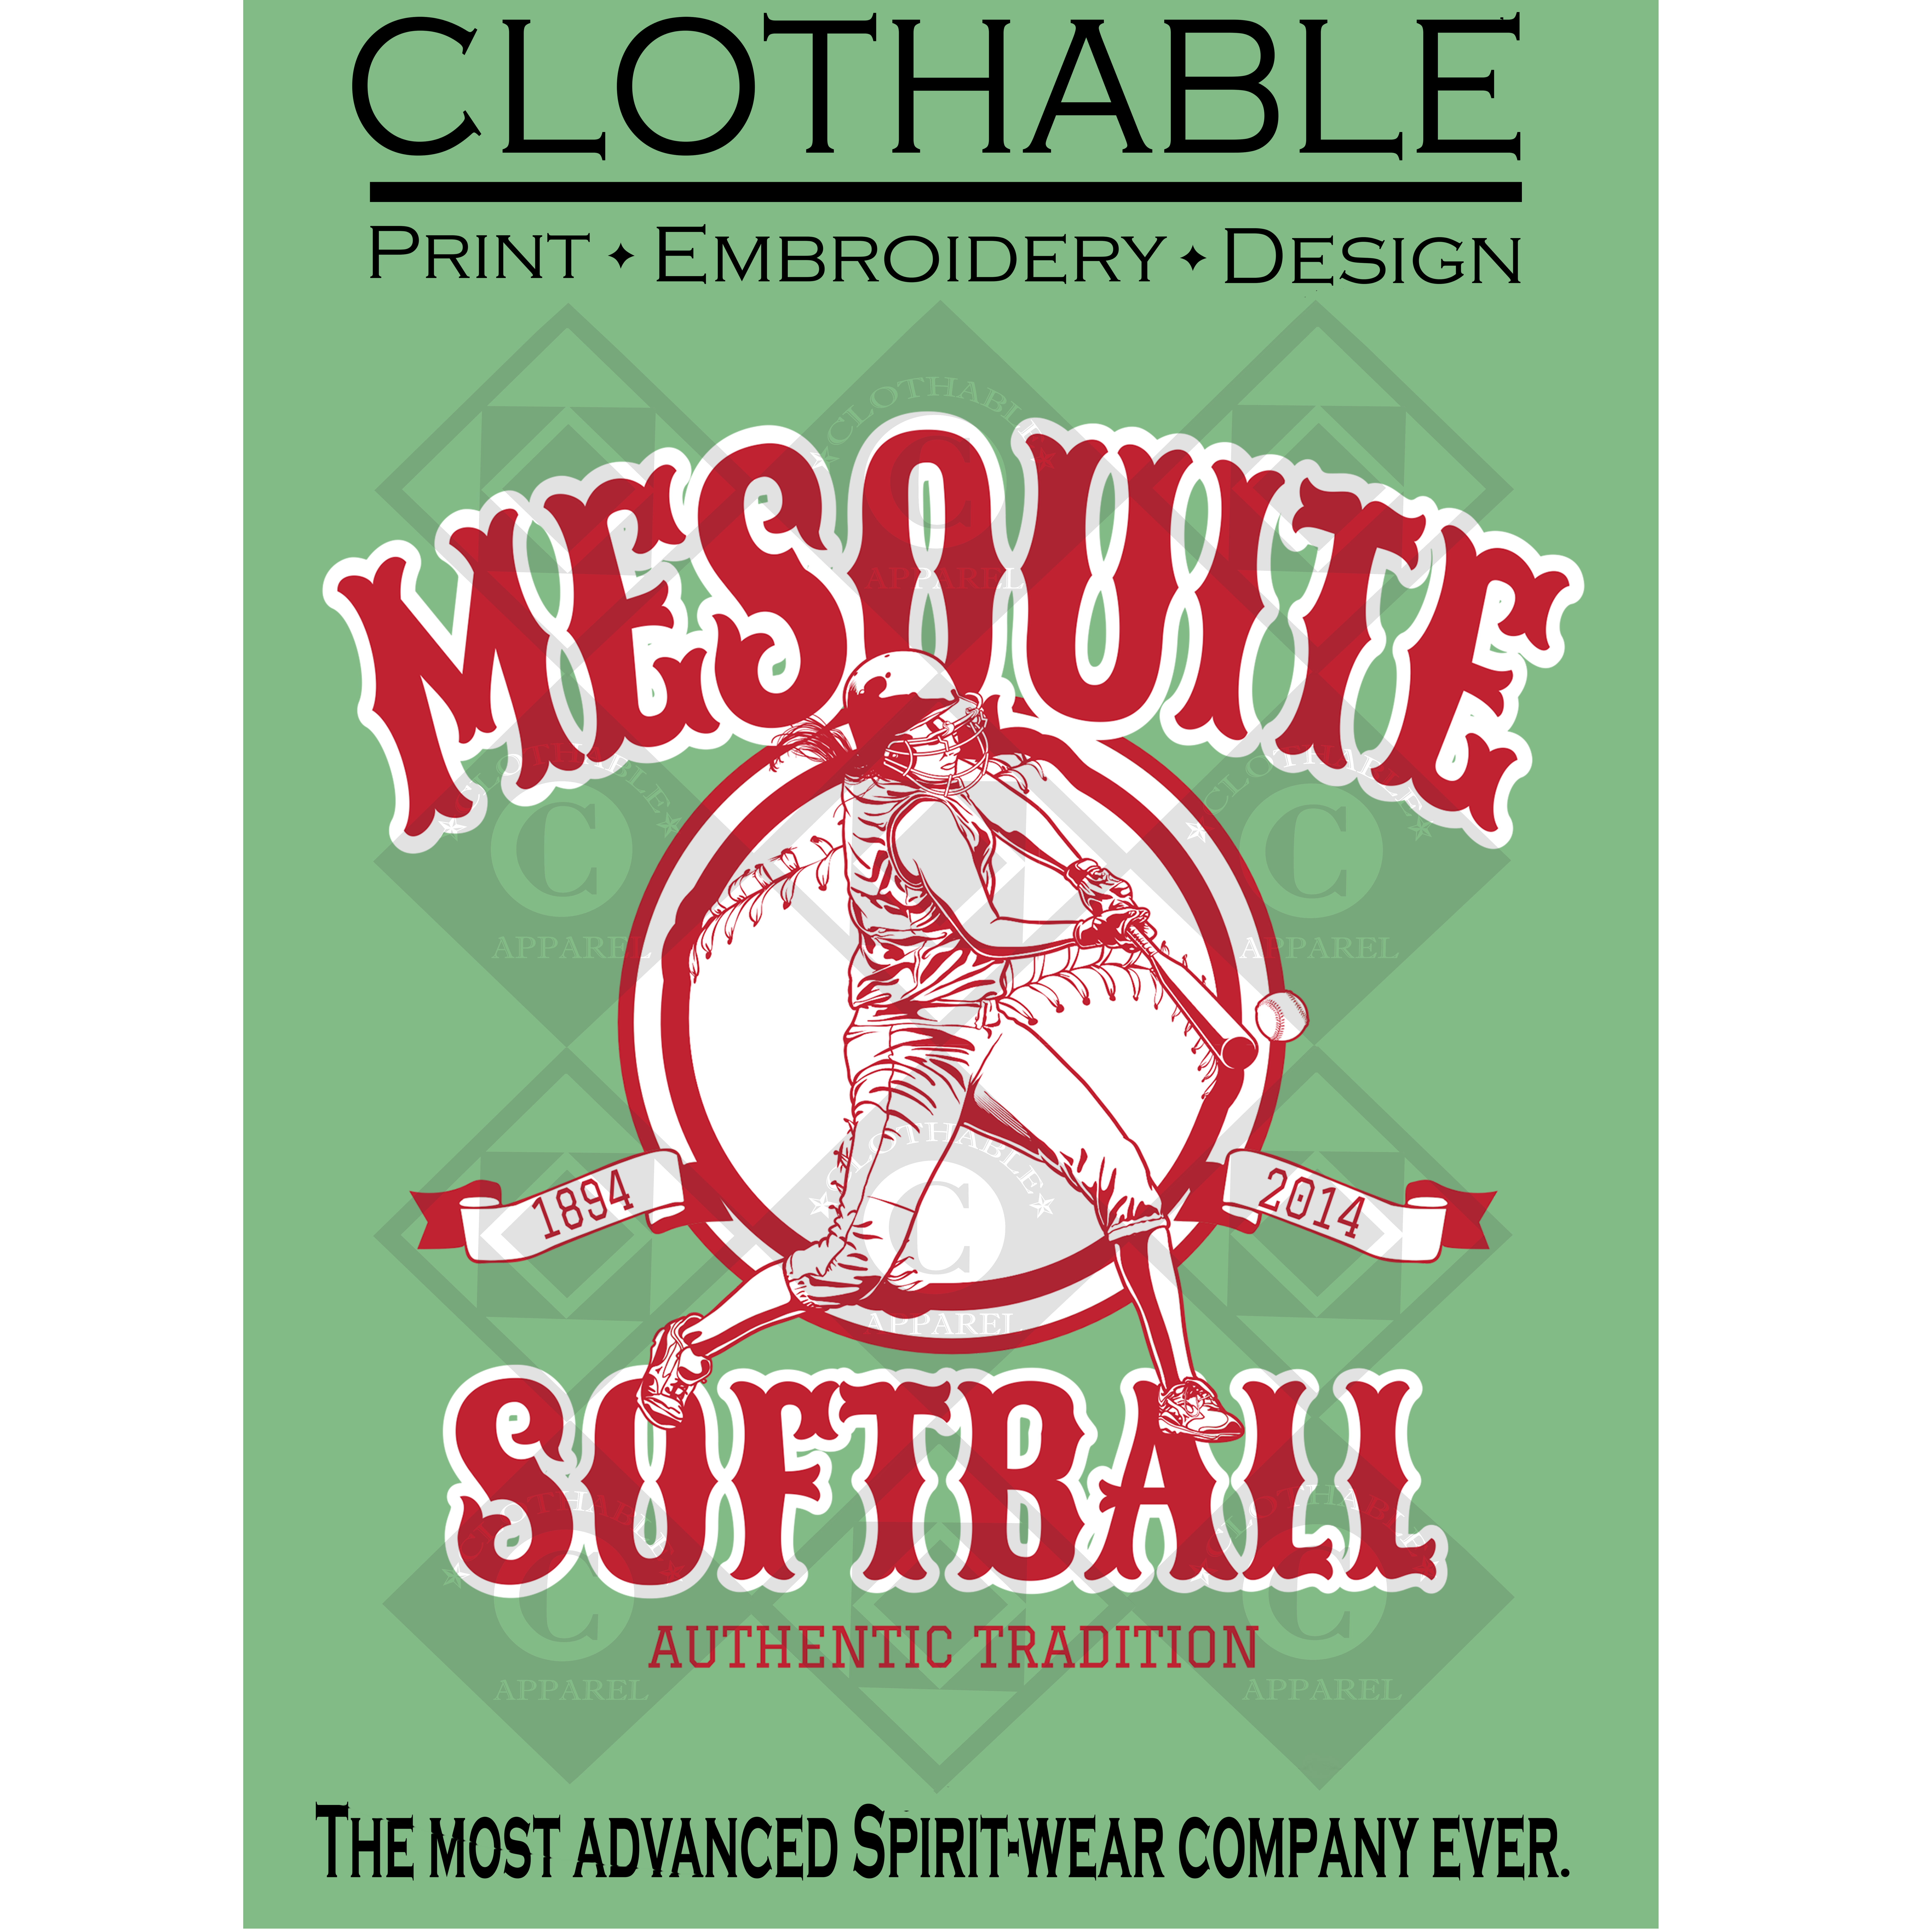 softball team tees by Clothable Girls softball designs